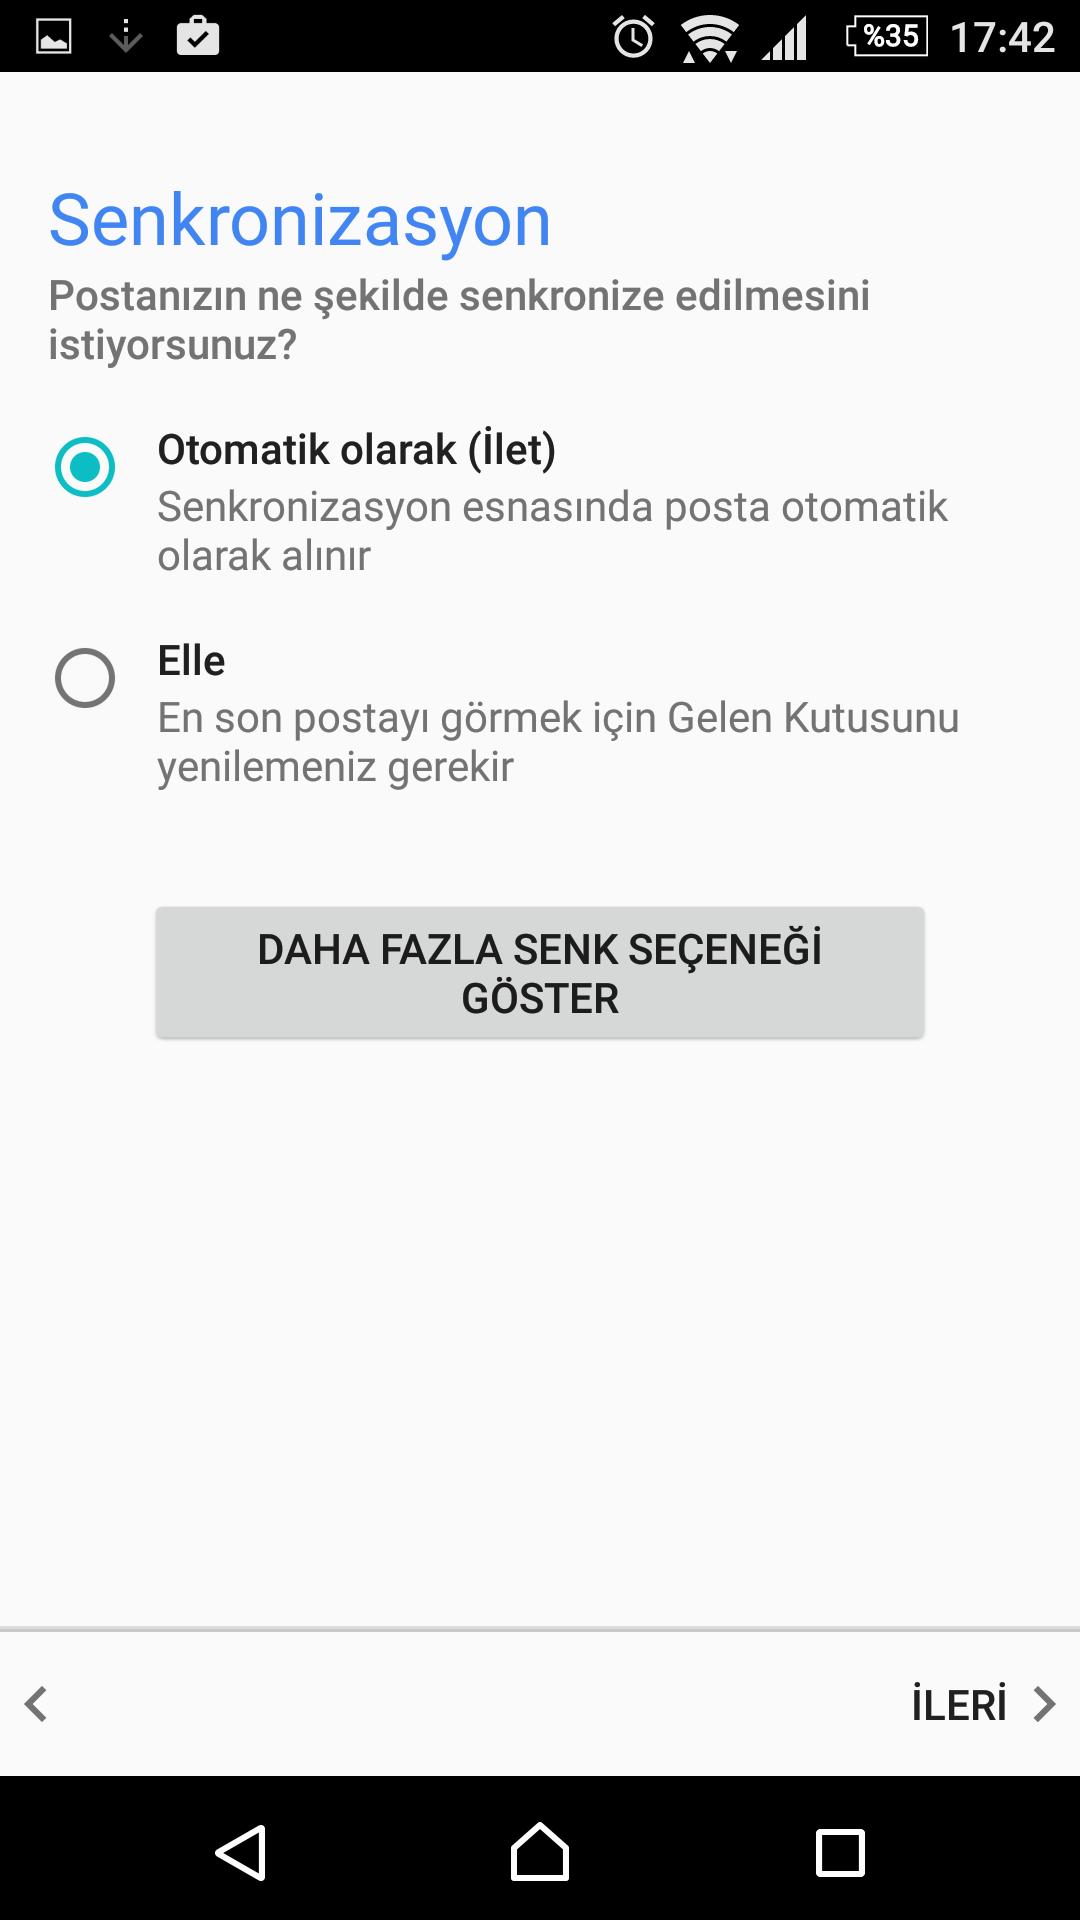 screenshot_20161118-174226